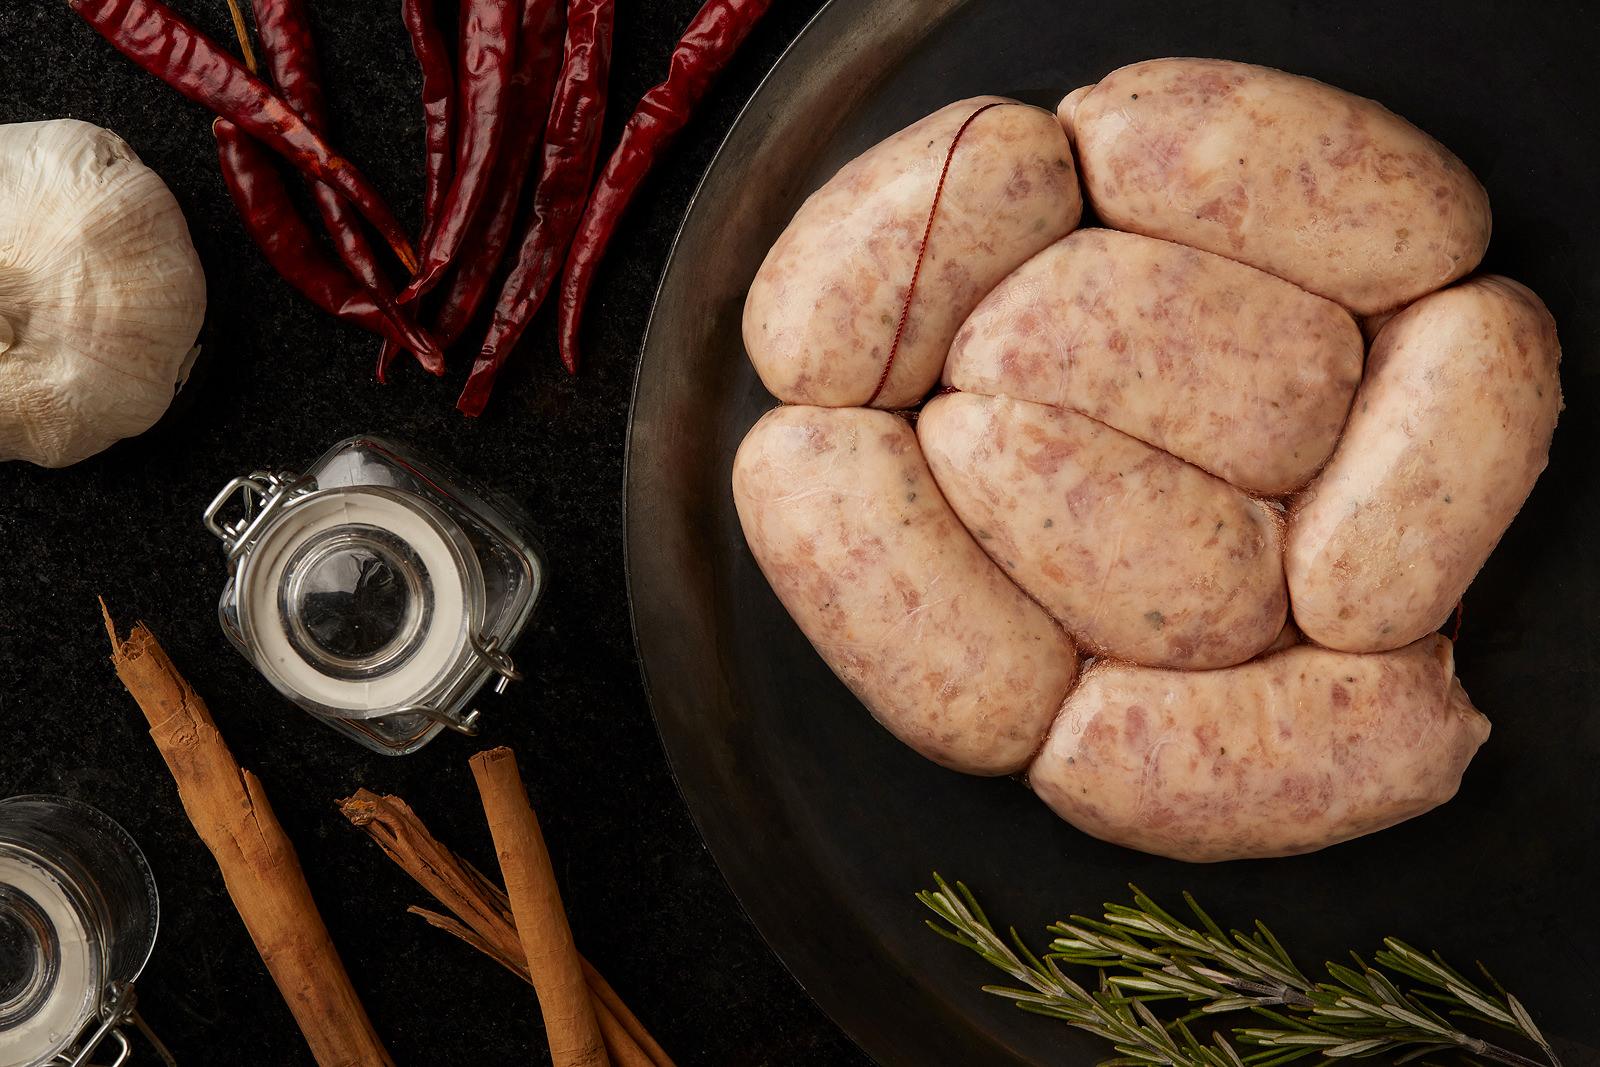 marcosvaldés|FOTÓGRAFO® food photographer // fotógrafo de alimentos